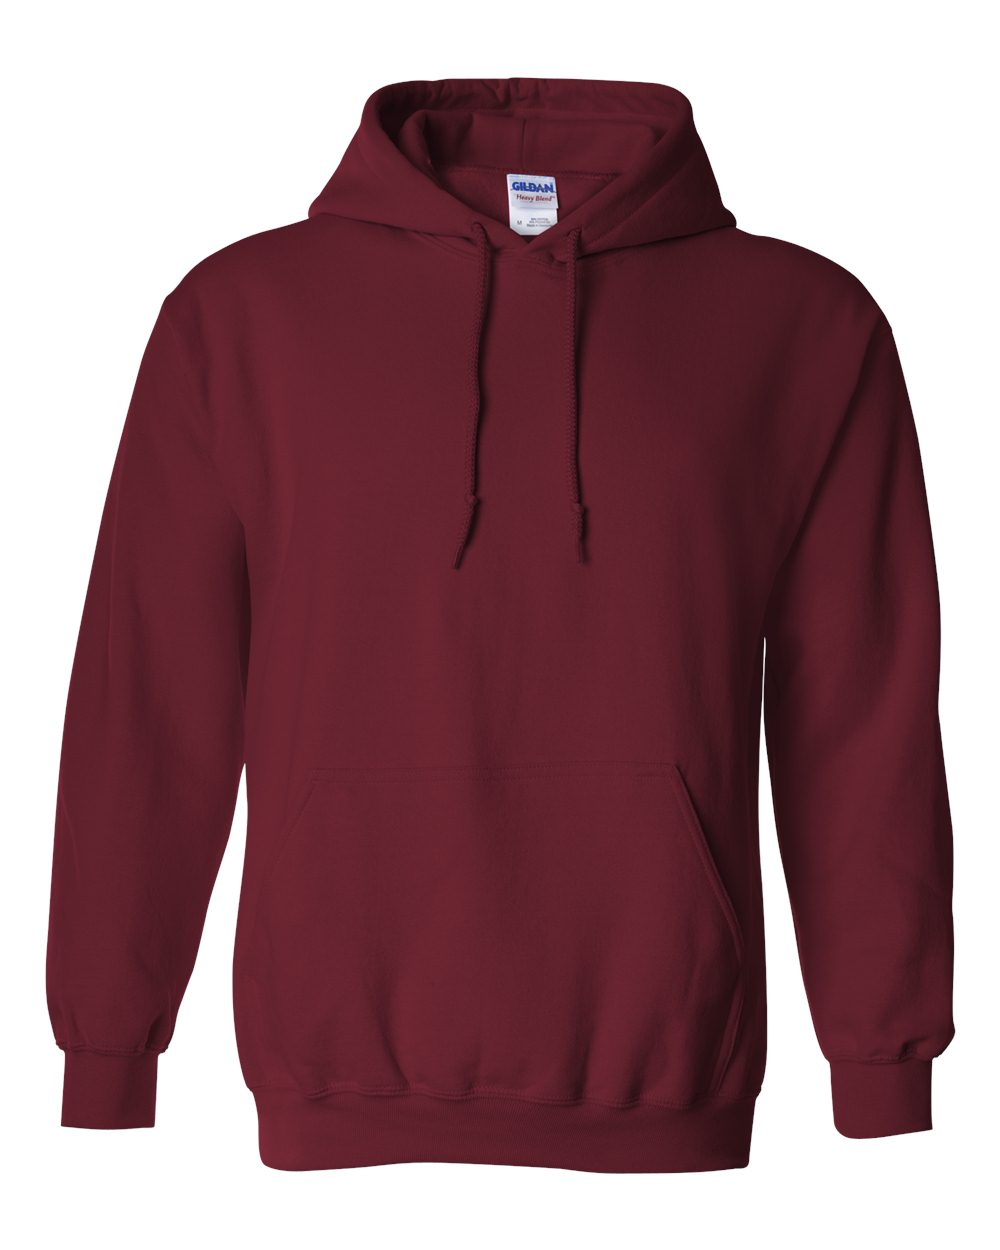 Gildan-Mens-Blank-Hoodie-Heavy-Blend-Hooded-Sweatshirt-Solid-18500-up-to-5XL thumbnail 30